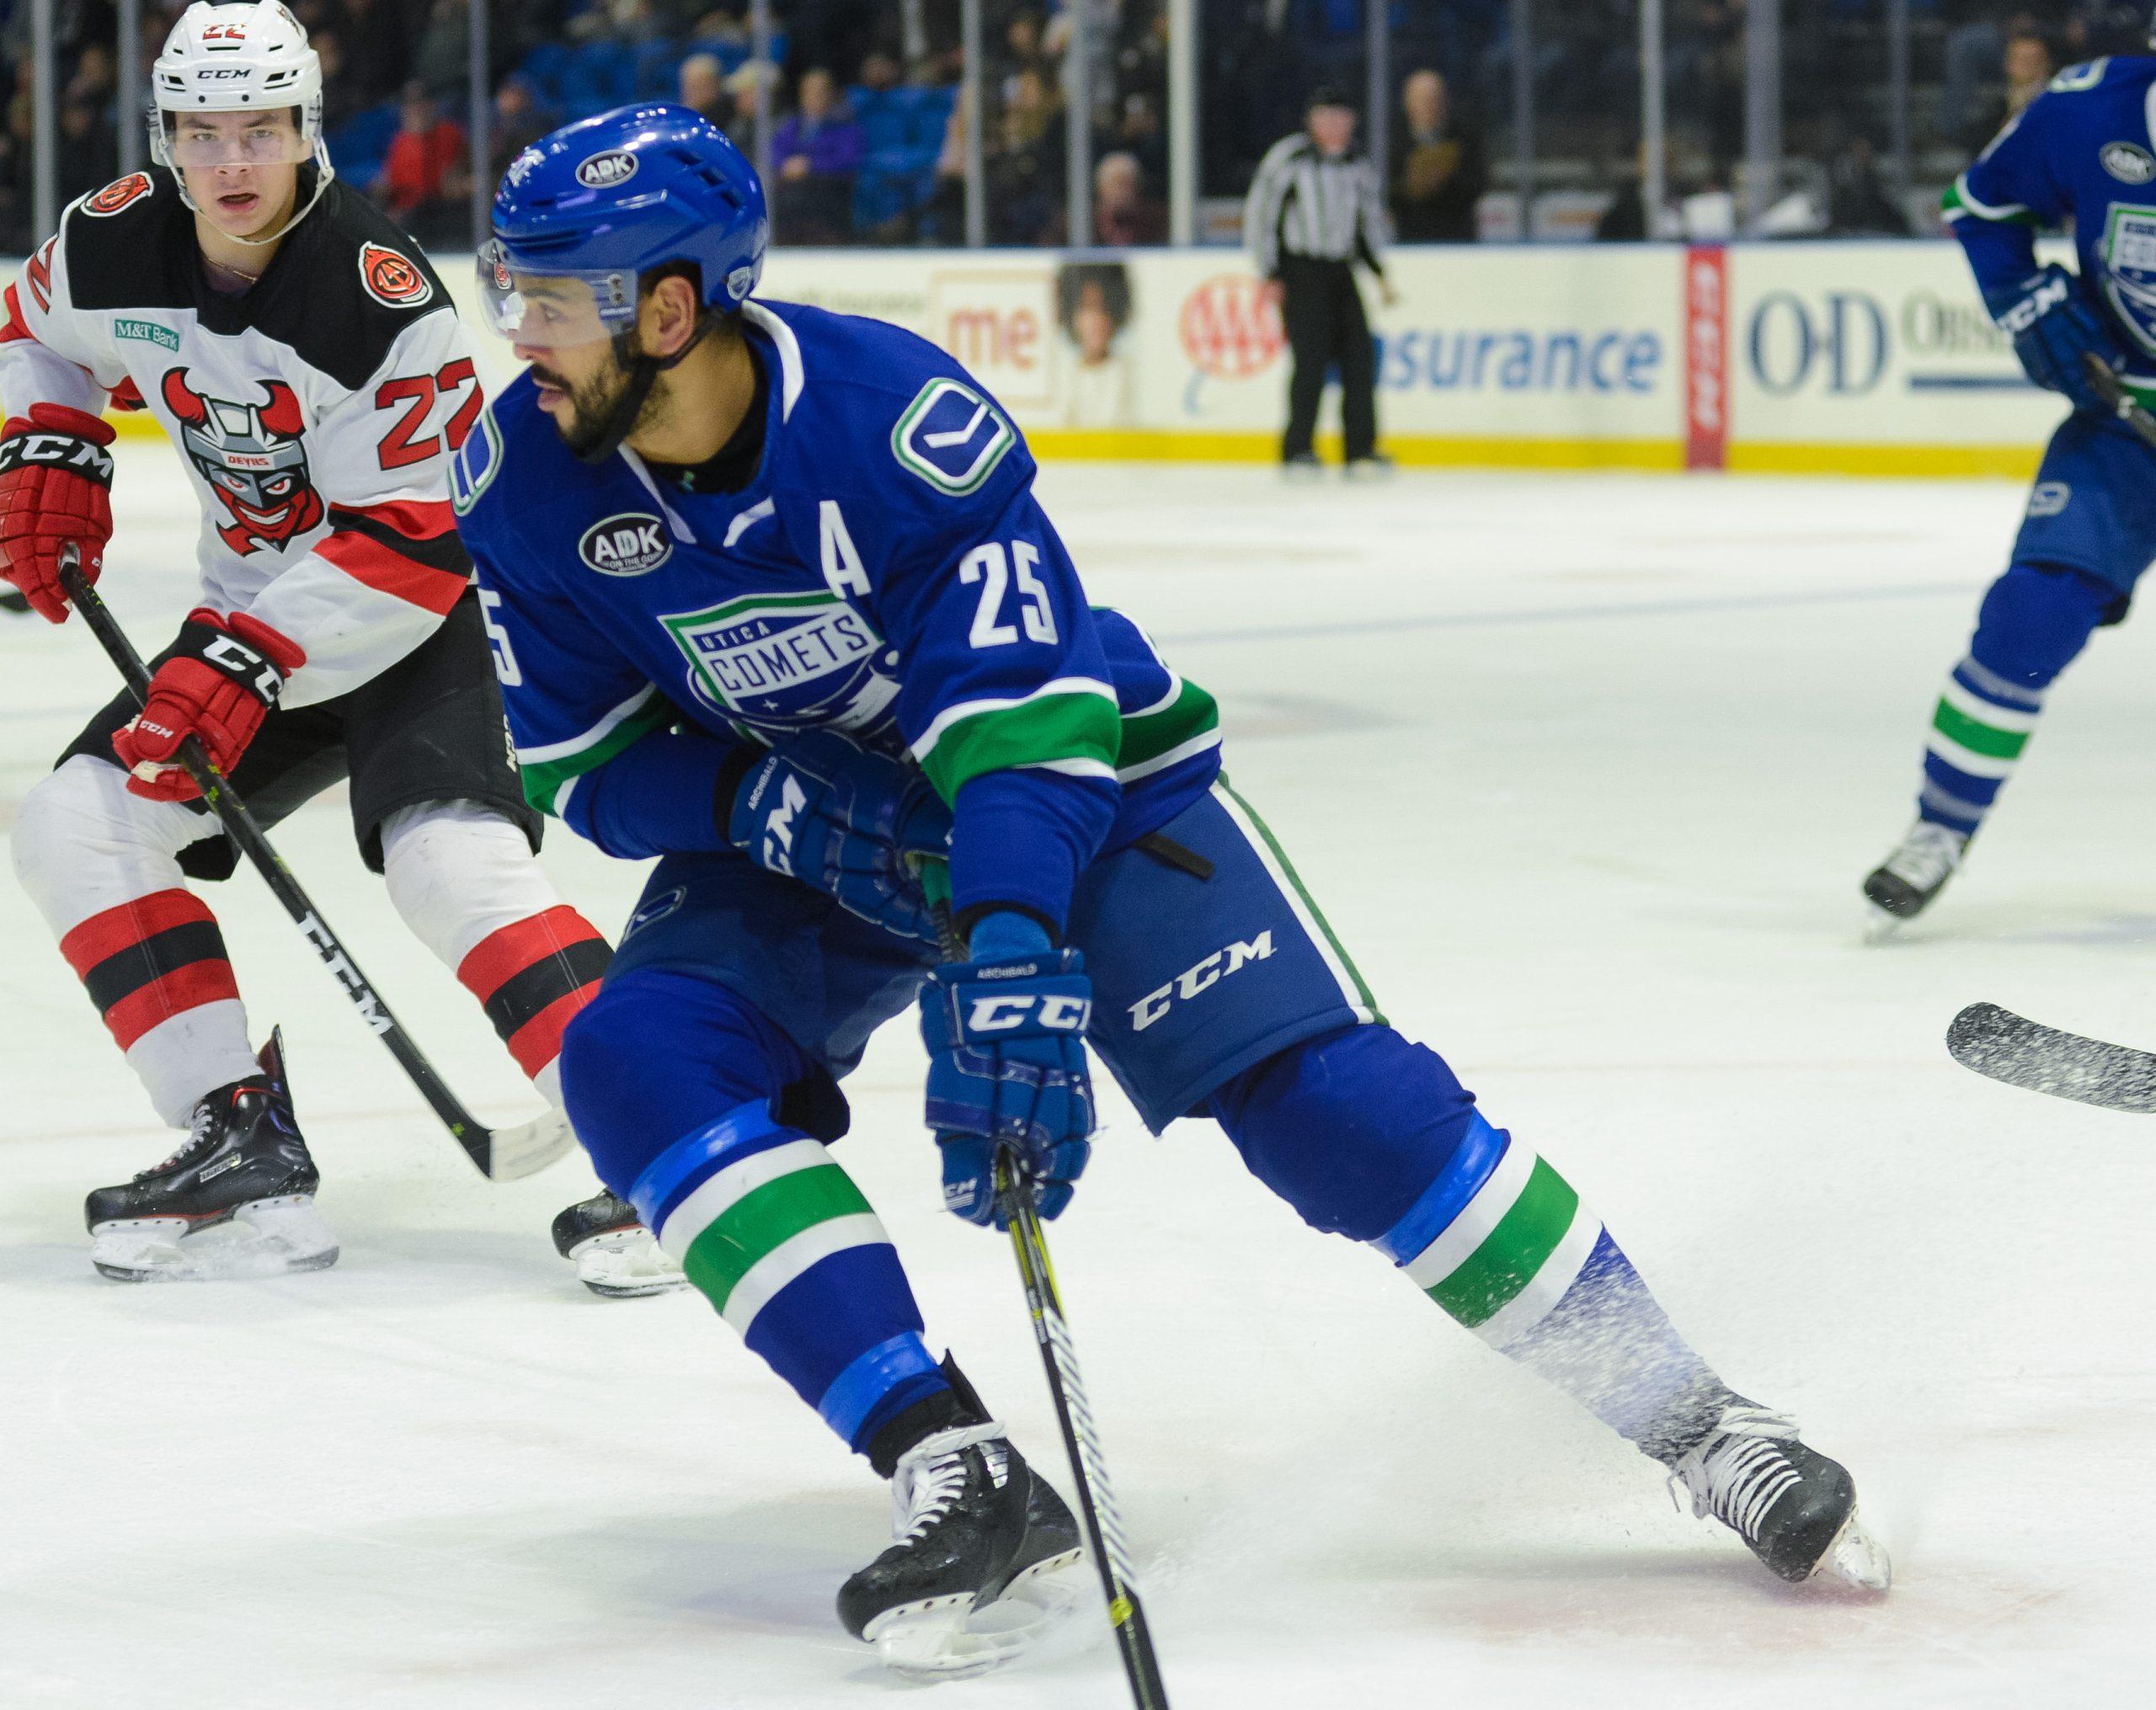 Belleville gets big forward, McKenna to Vancouver, as part of Sens/Canucks swap